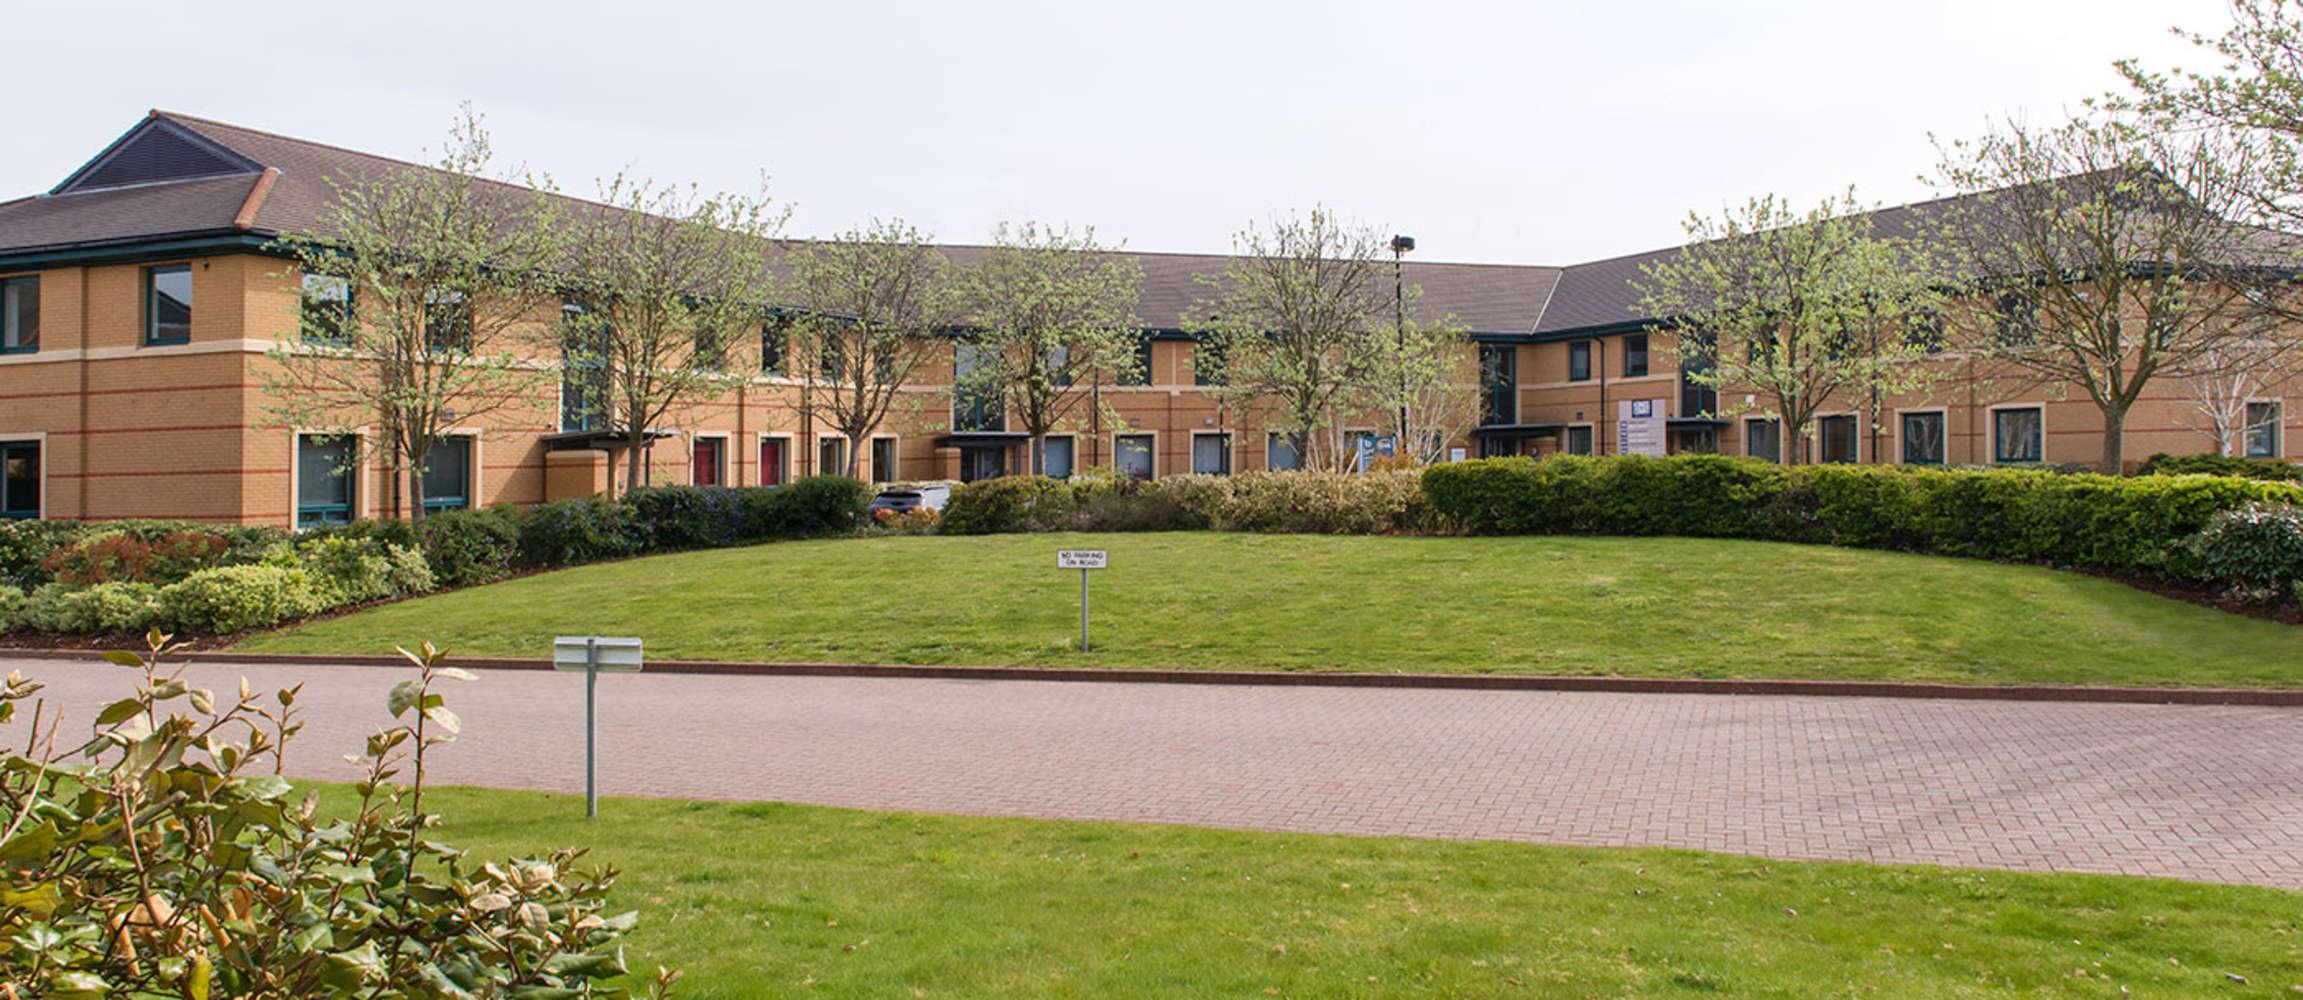 Office Birmingham, B37 7YE - 2665 Kings Court, Birmingham Business Park - 1